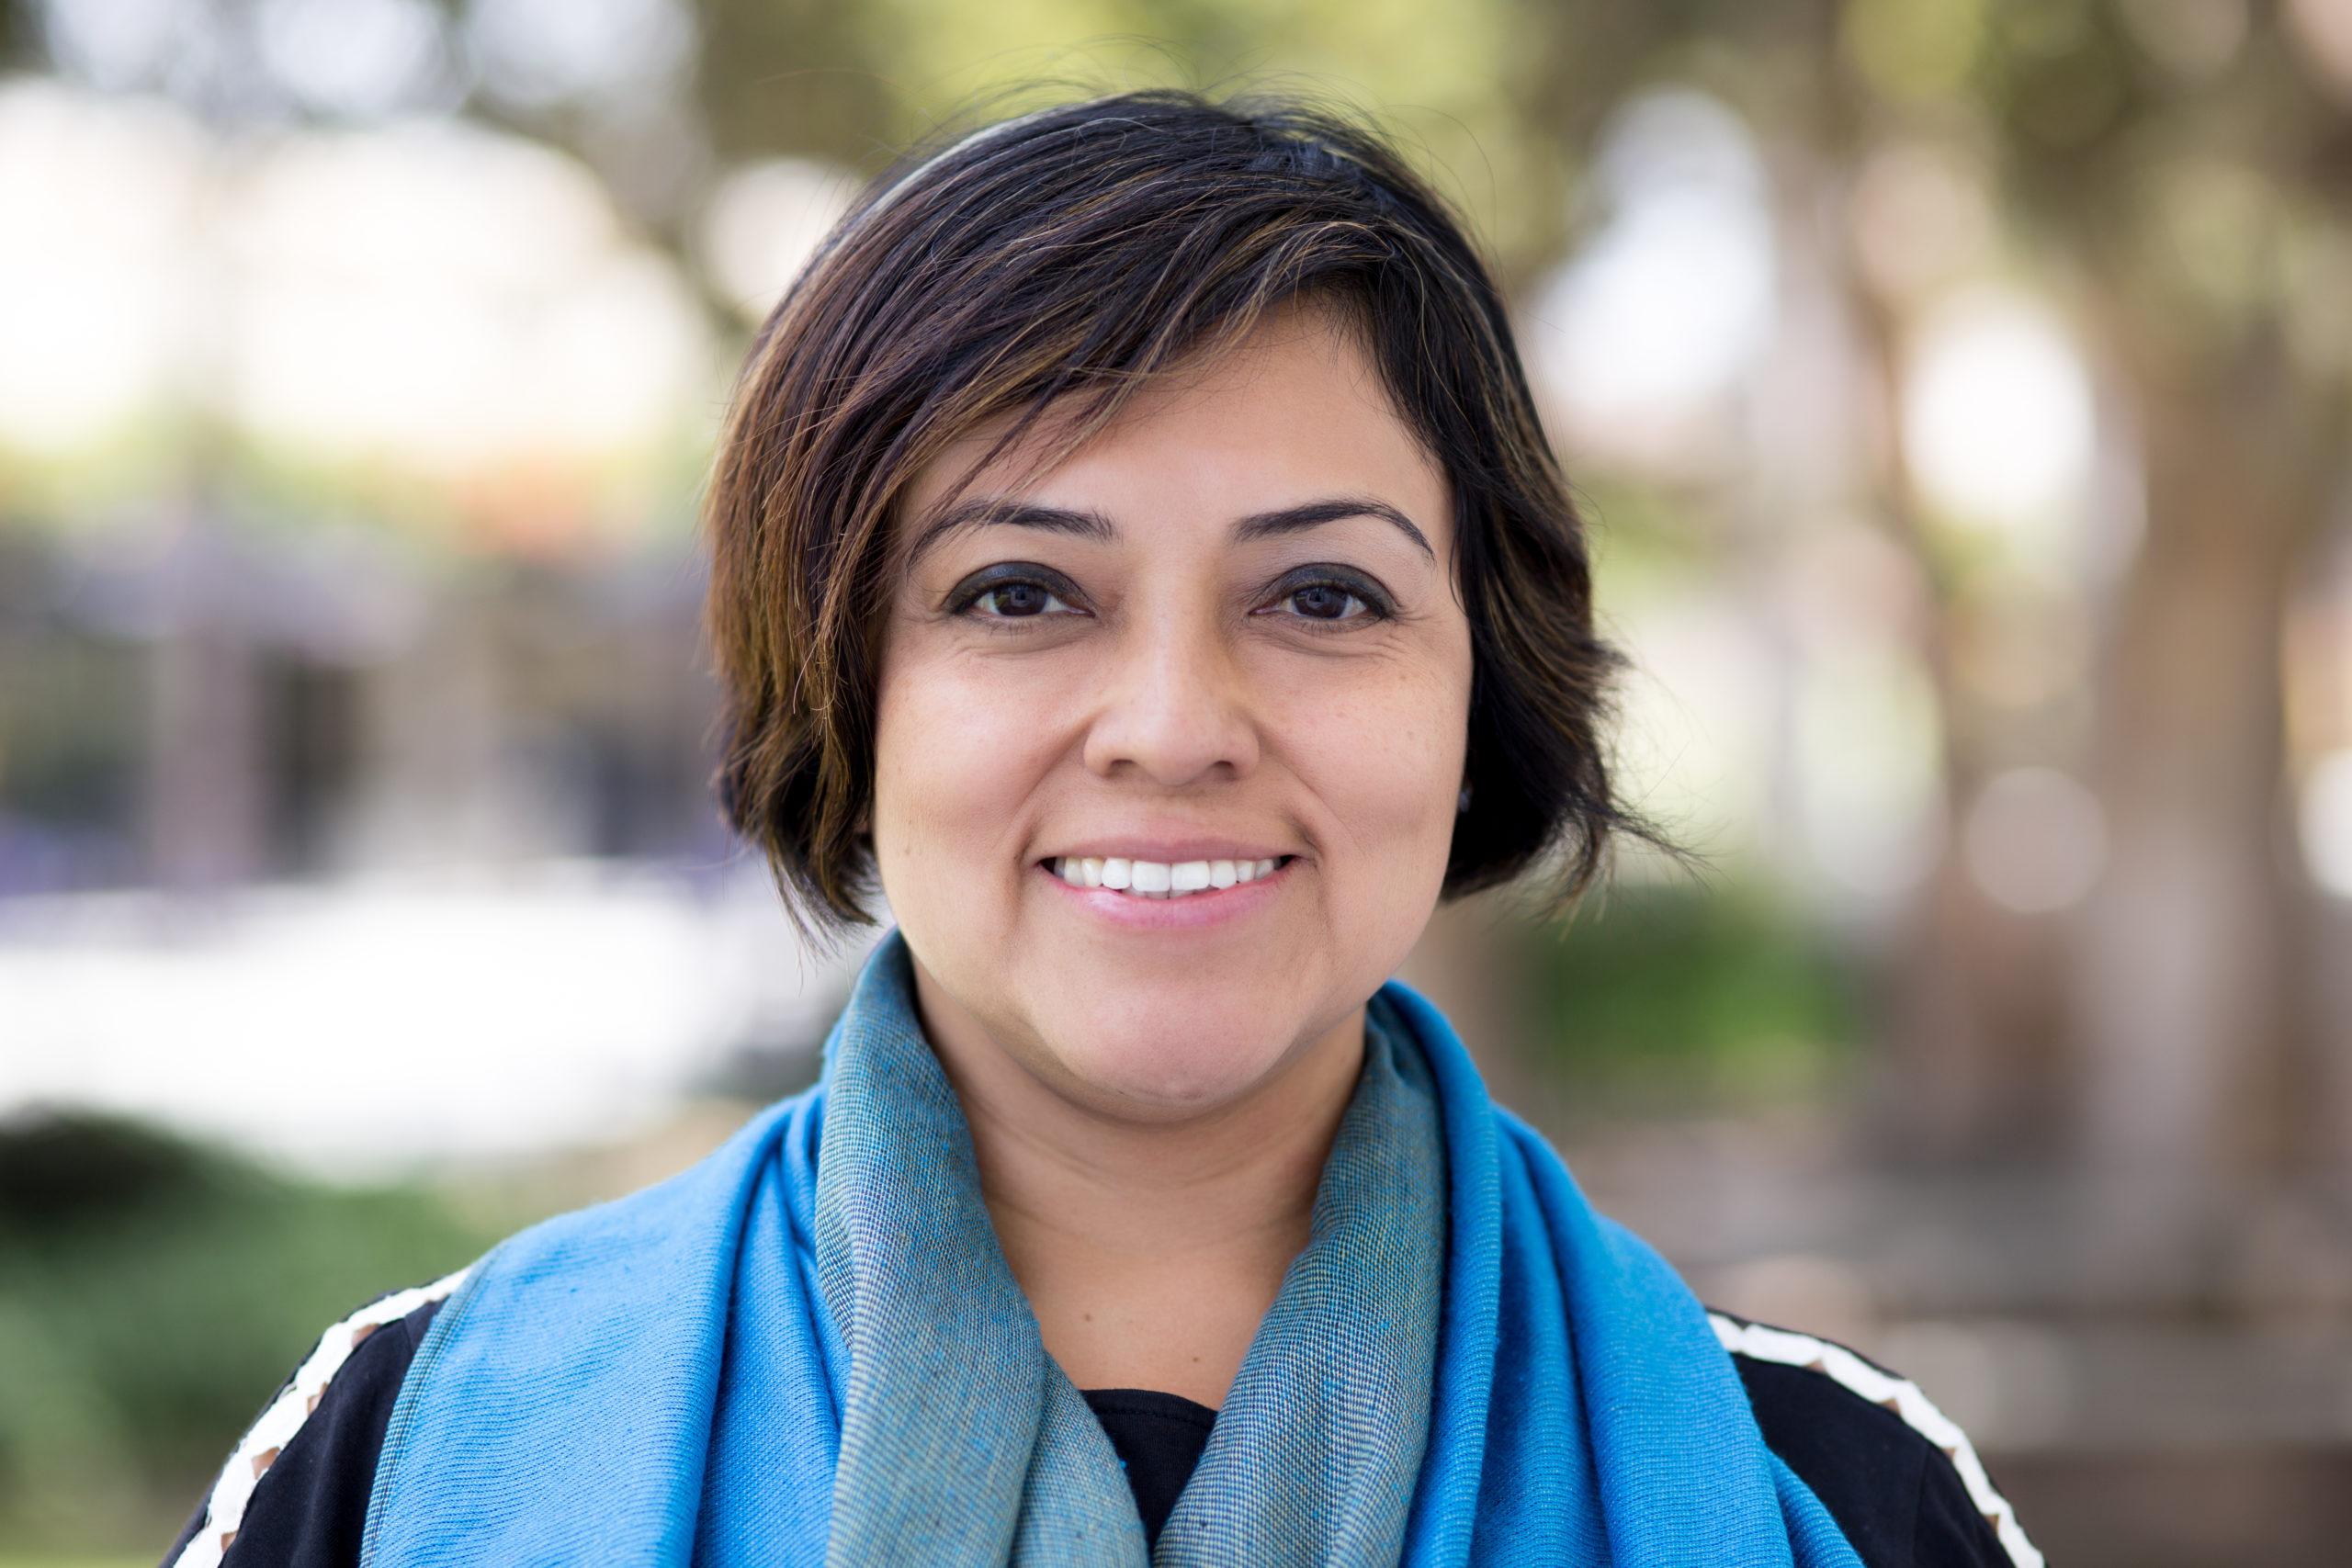 Leyda Garcia headshot scaled - Doctoral Student Studies Resilience of Unaccompanied Youth